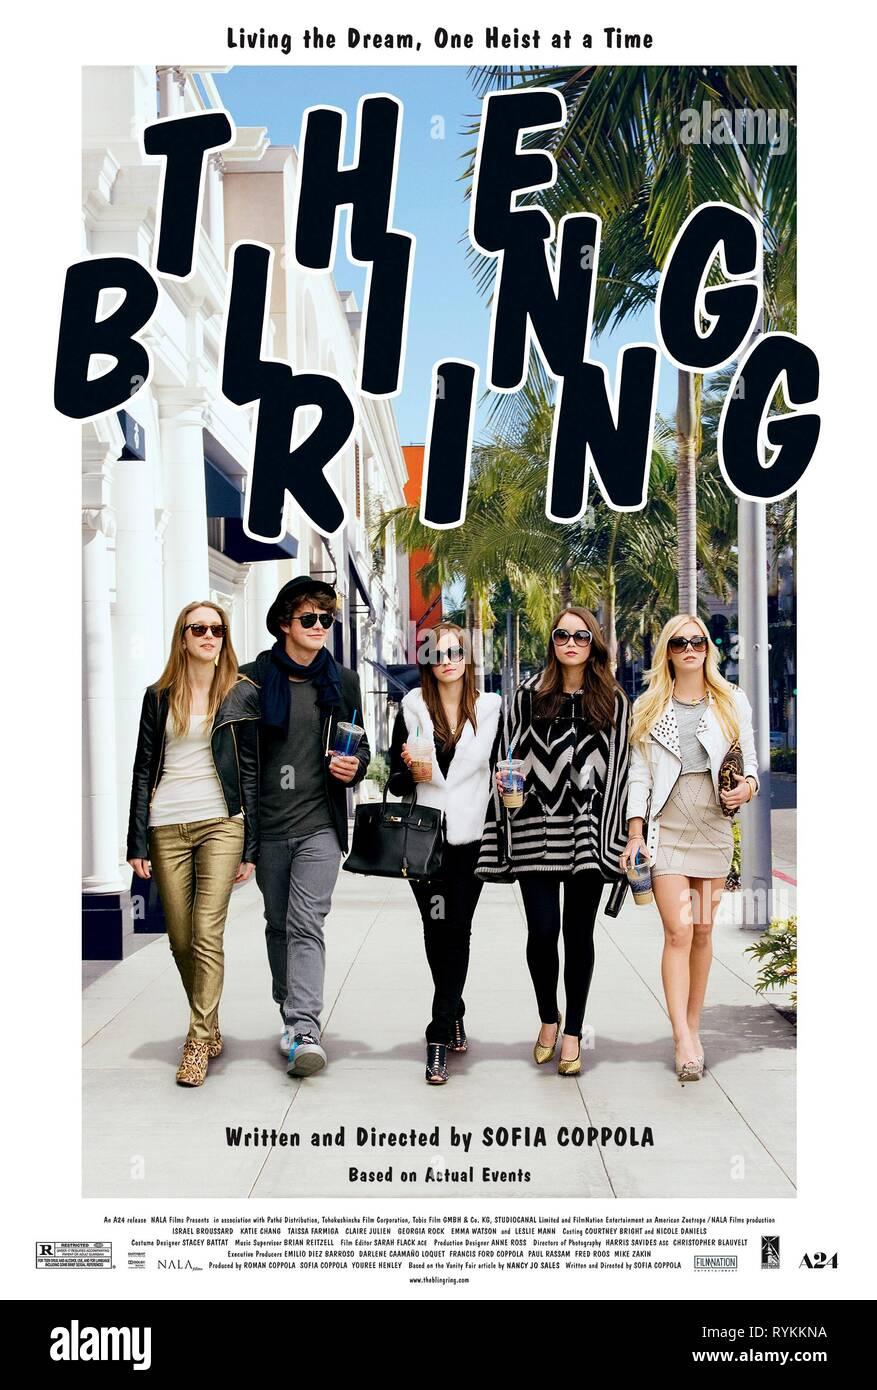 FARMIGA,BROUSSARD,WATSON,CHANG,POSTER, THE BLING RING, 2013 - Stock Image